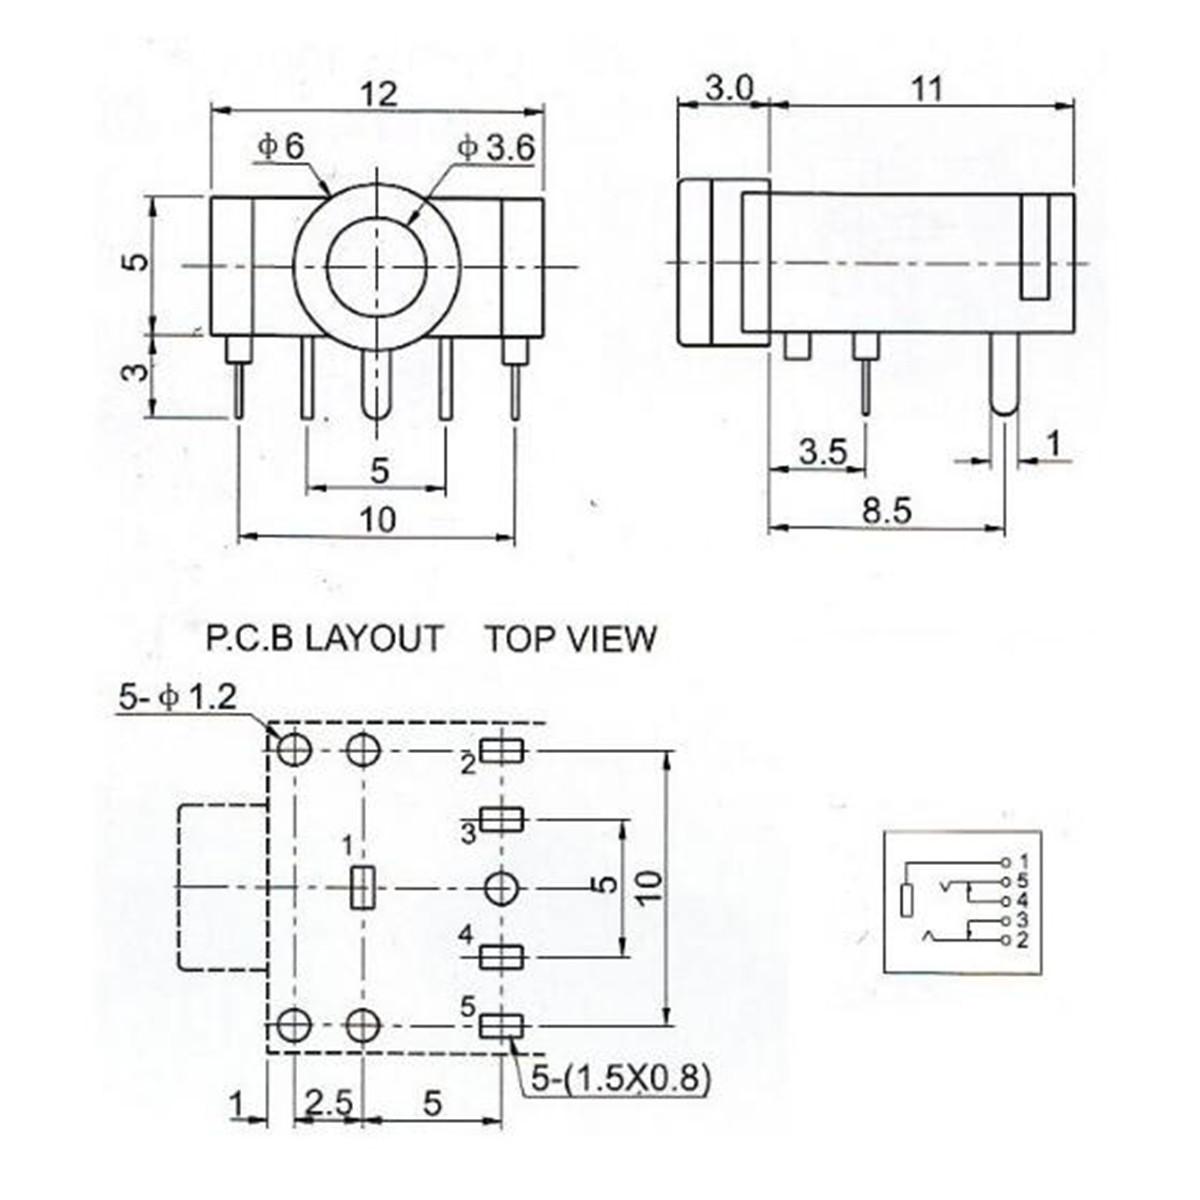 10pcs 35mm Female Stereo Audio Socket Headphone Jack Connector 5 Plug Wiring Diagram Besides Pin Pcb Mount